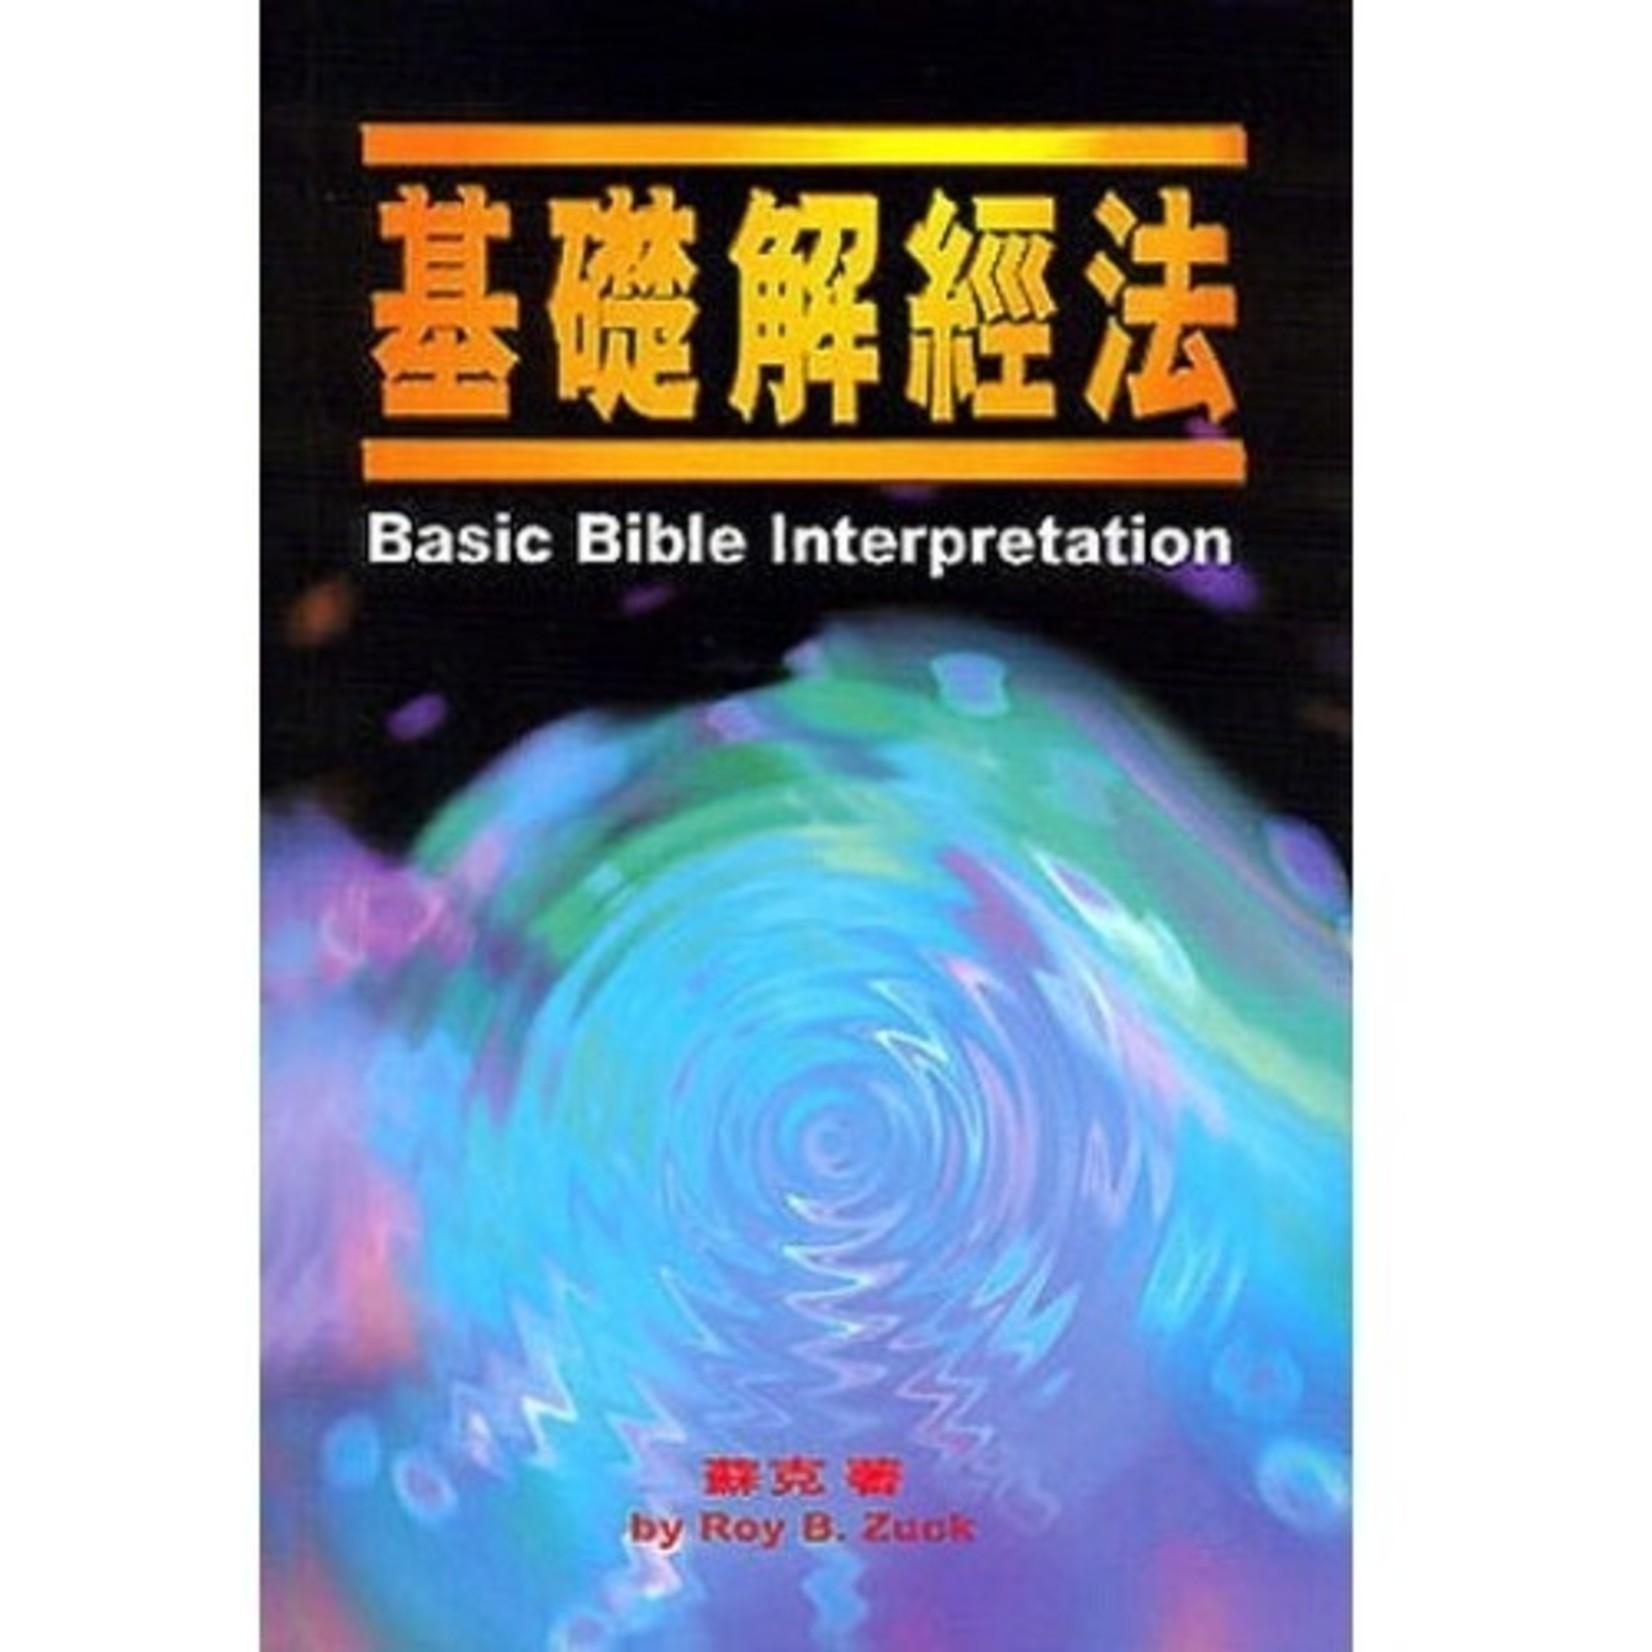 宣道 China Alliance Press 基礎解經法 Basic Bible Interpretation